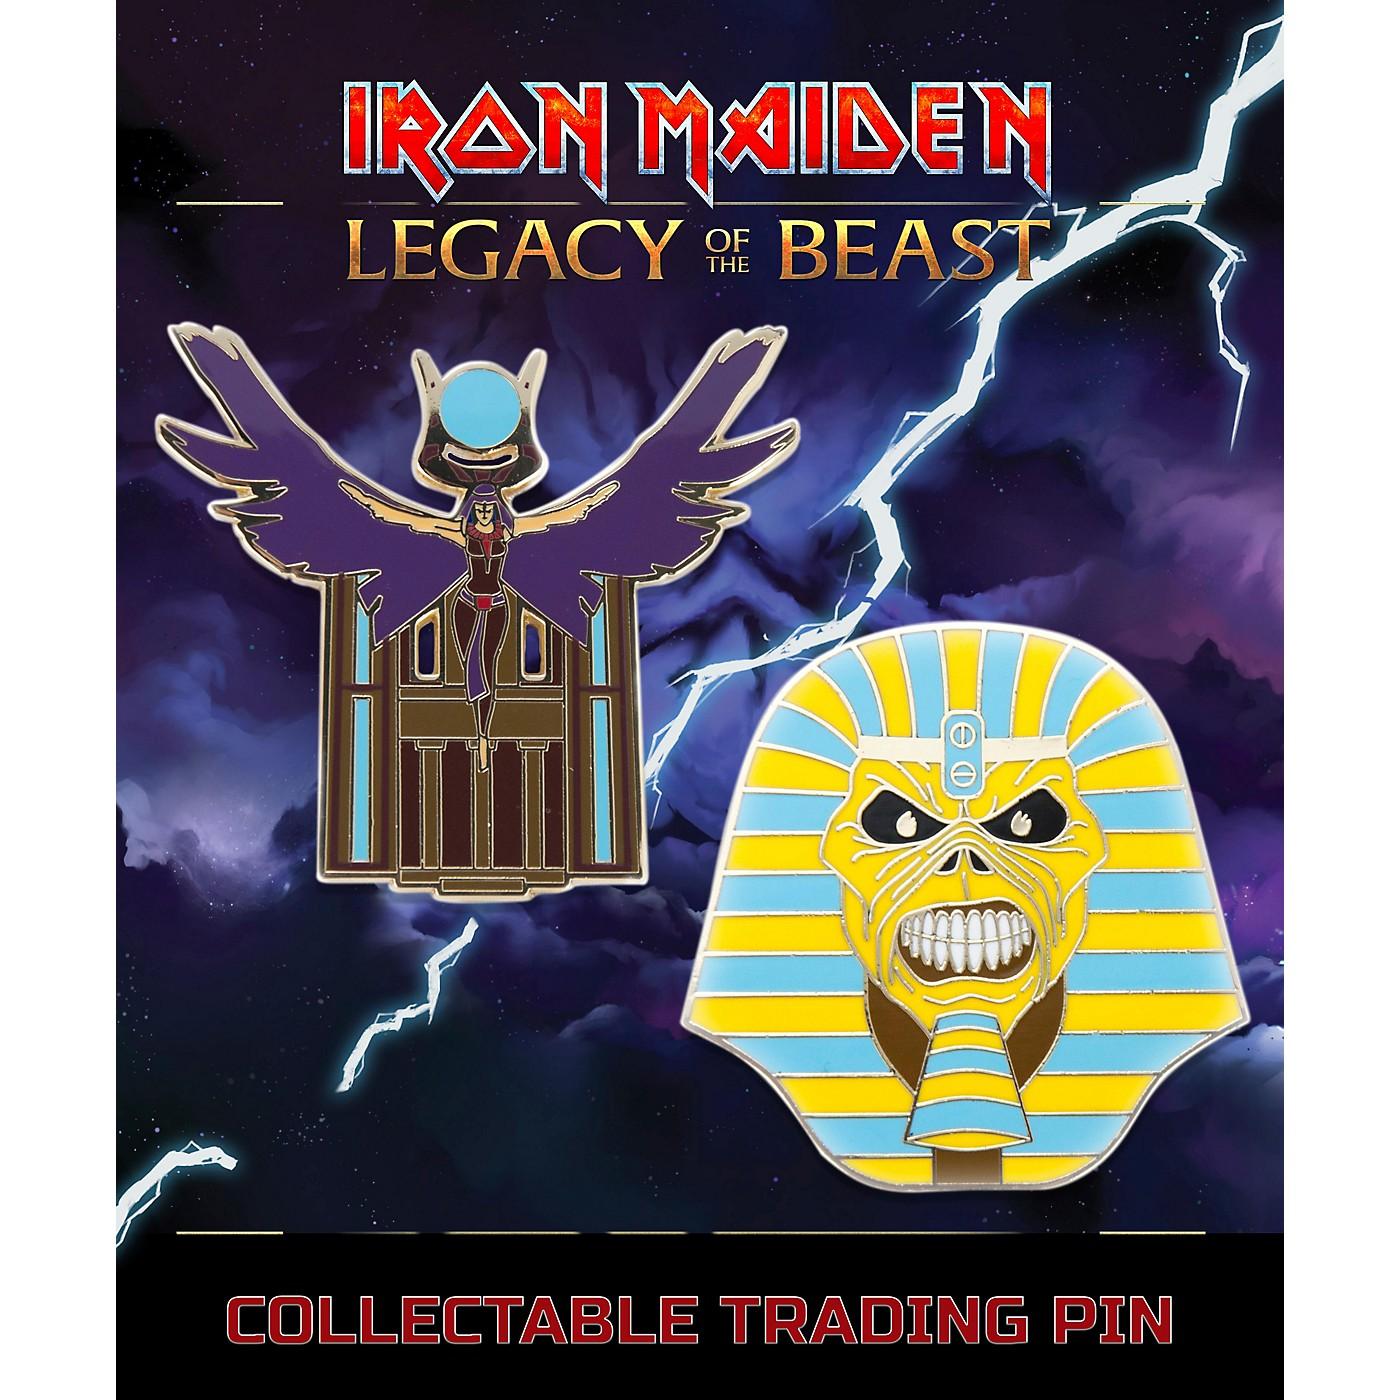 Entertainment Earth Iron Maiden Set #2 Pharaoh and Aset Lapel Pin 2-Pack thumbnail